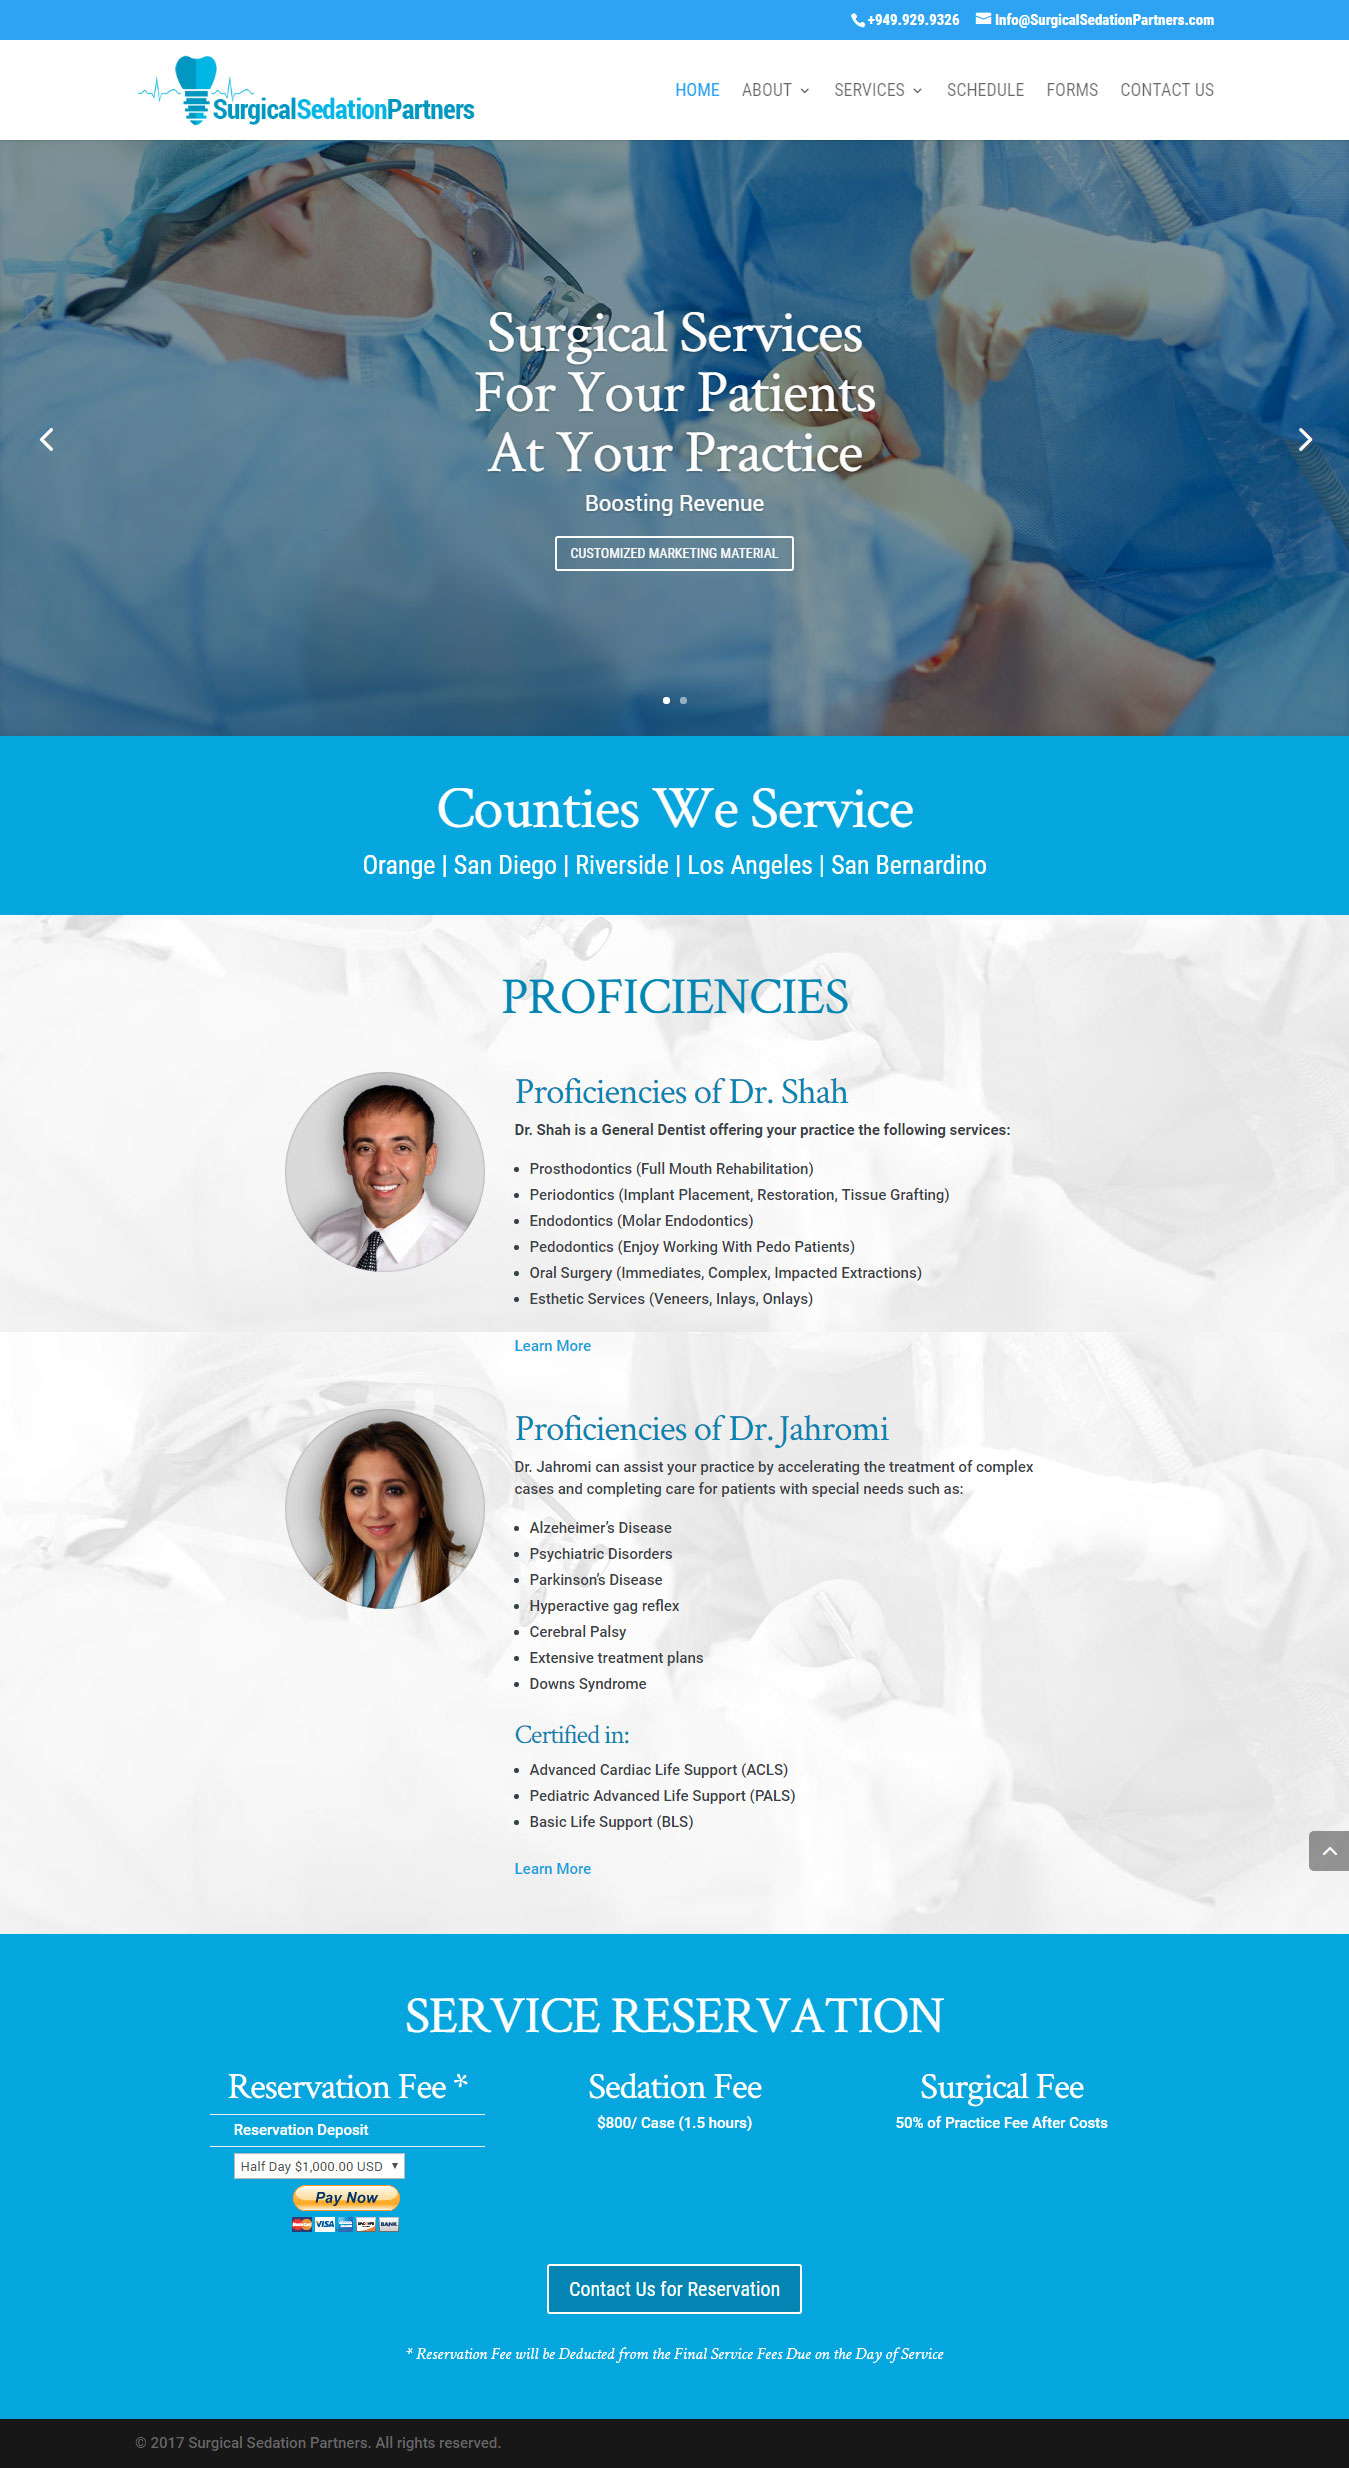 Responsive Website in WordPress (Divi theme)